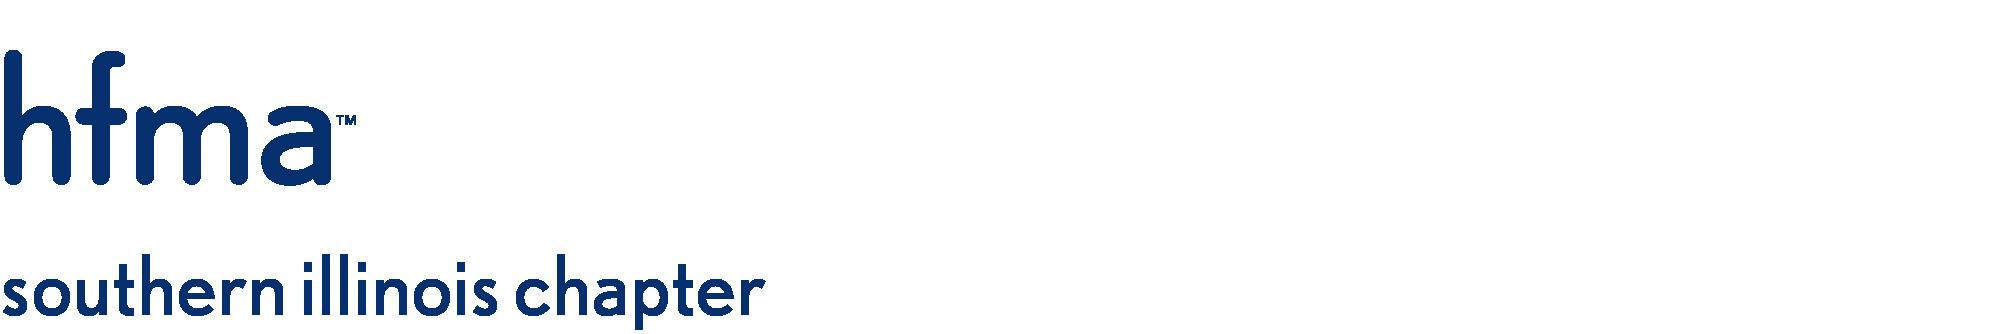 CHP_171214_ChapterLogos_Horizontal_Southern_Illino